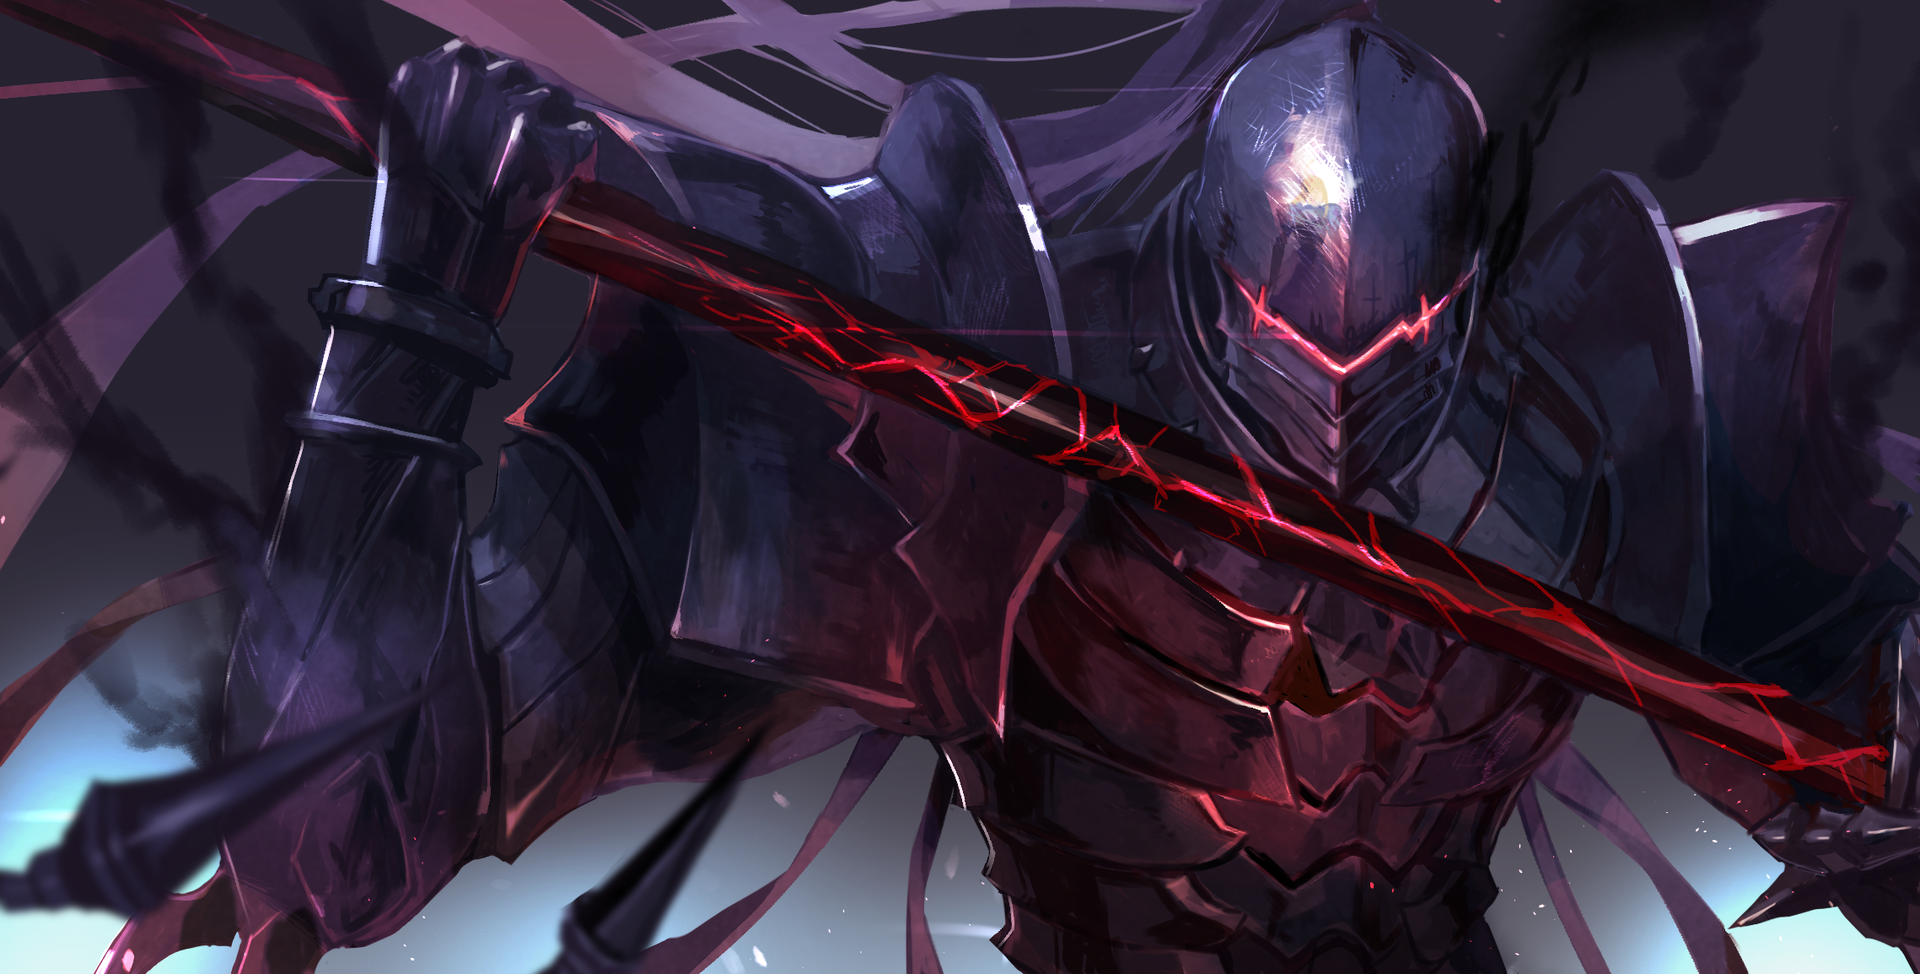 The Berserker of Remnant - Chapter 1 - Wattpad